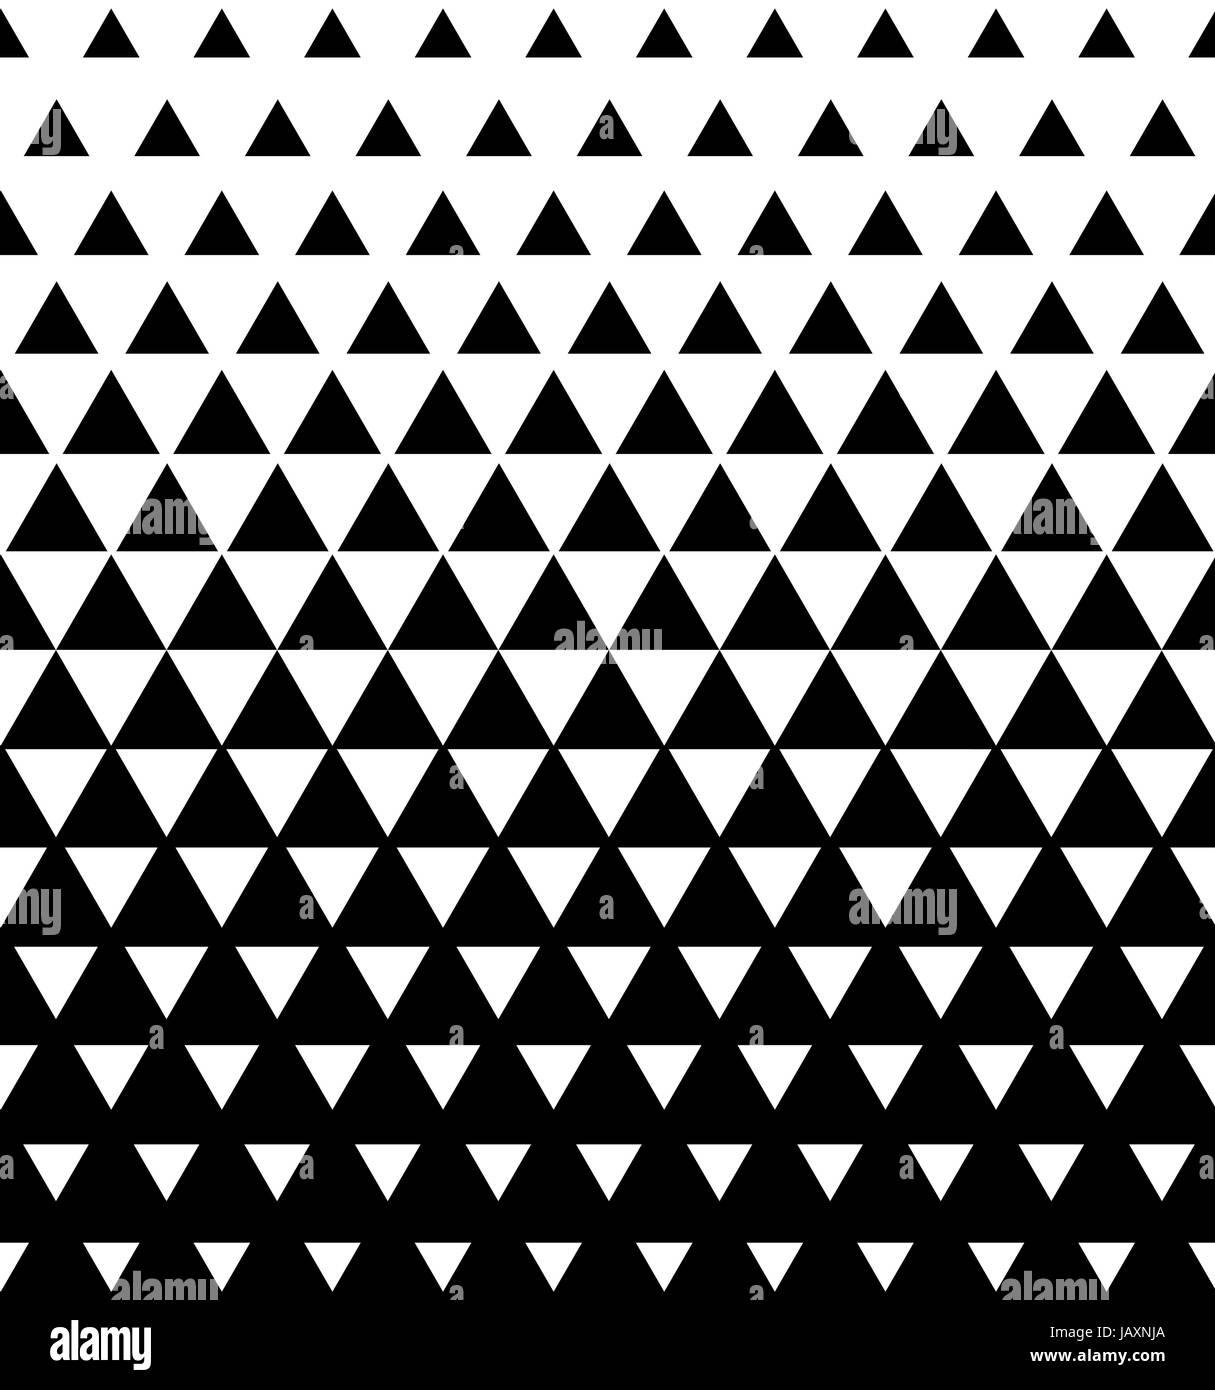 Halftone Triangular Pattern Vector Abstract Transition Triangular